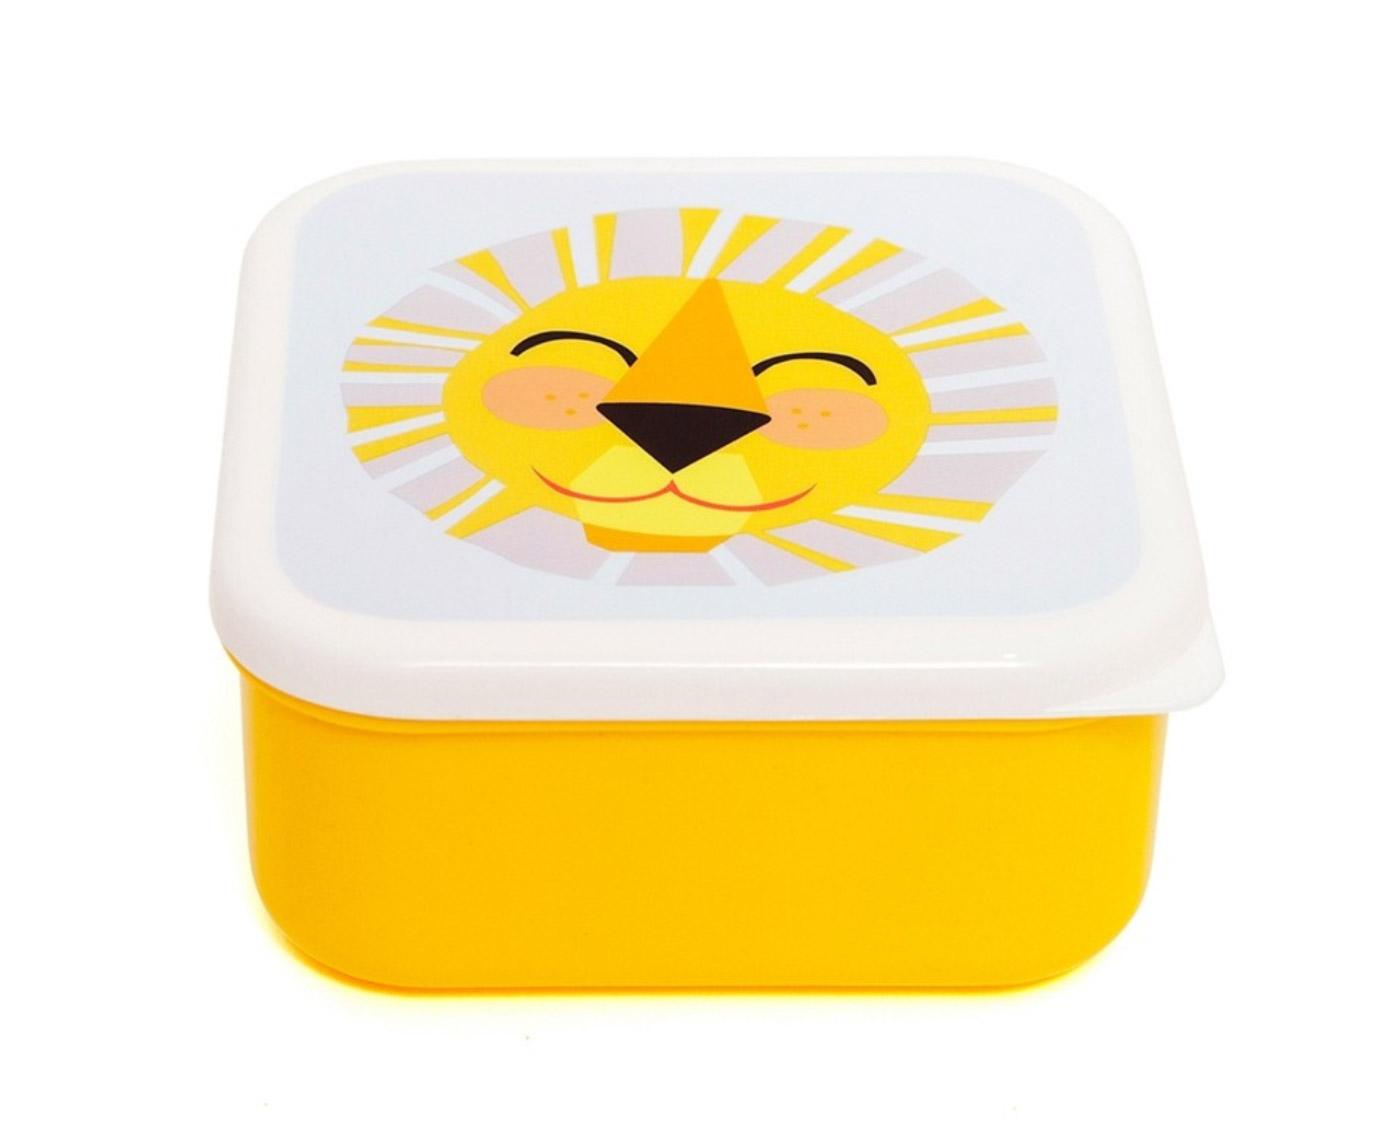 Trommelset 'Shiny Lion'